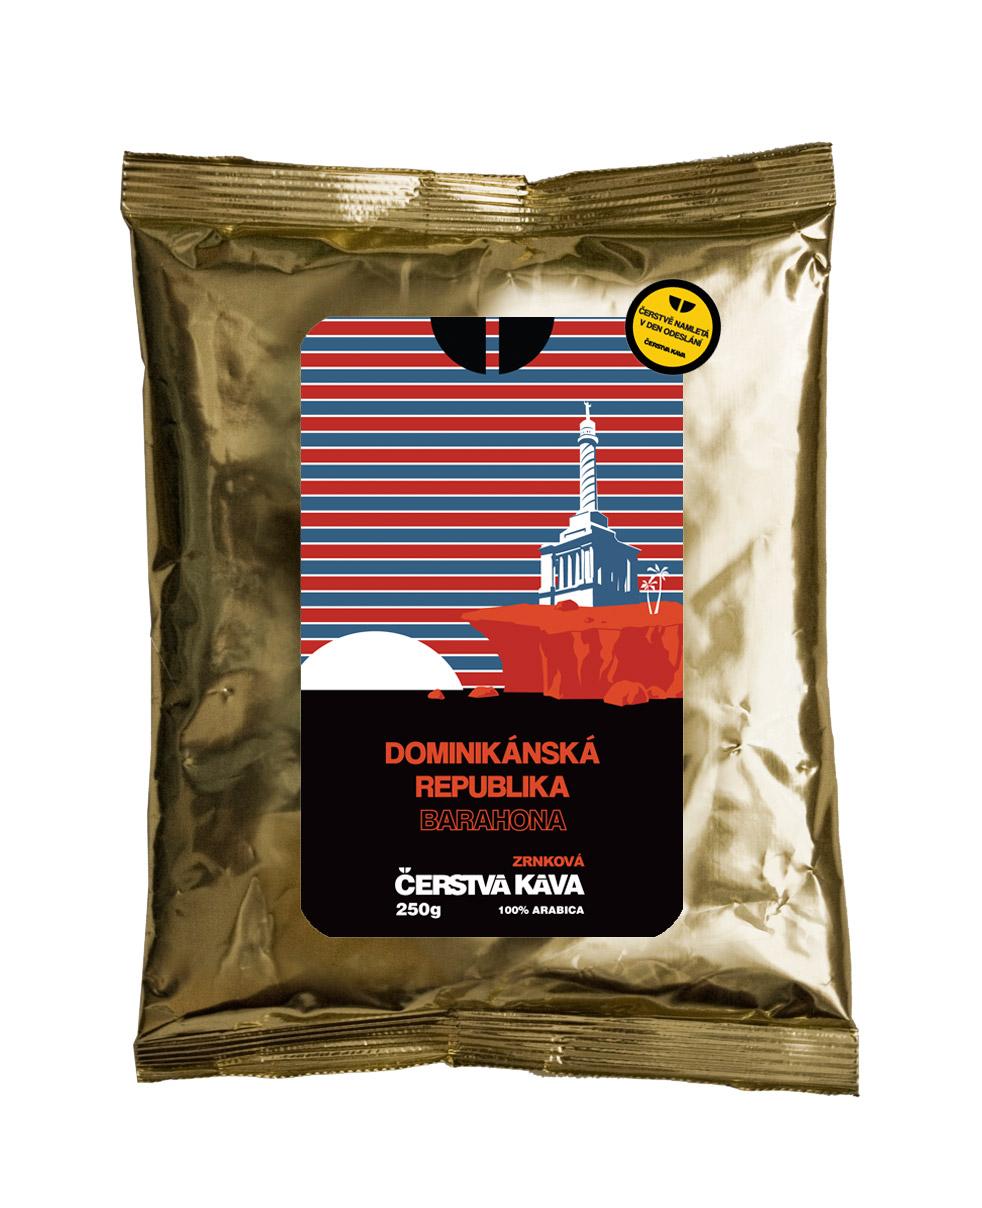 Káva Dominikánská republika Barahona, mletá - sáček 250 g